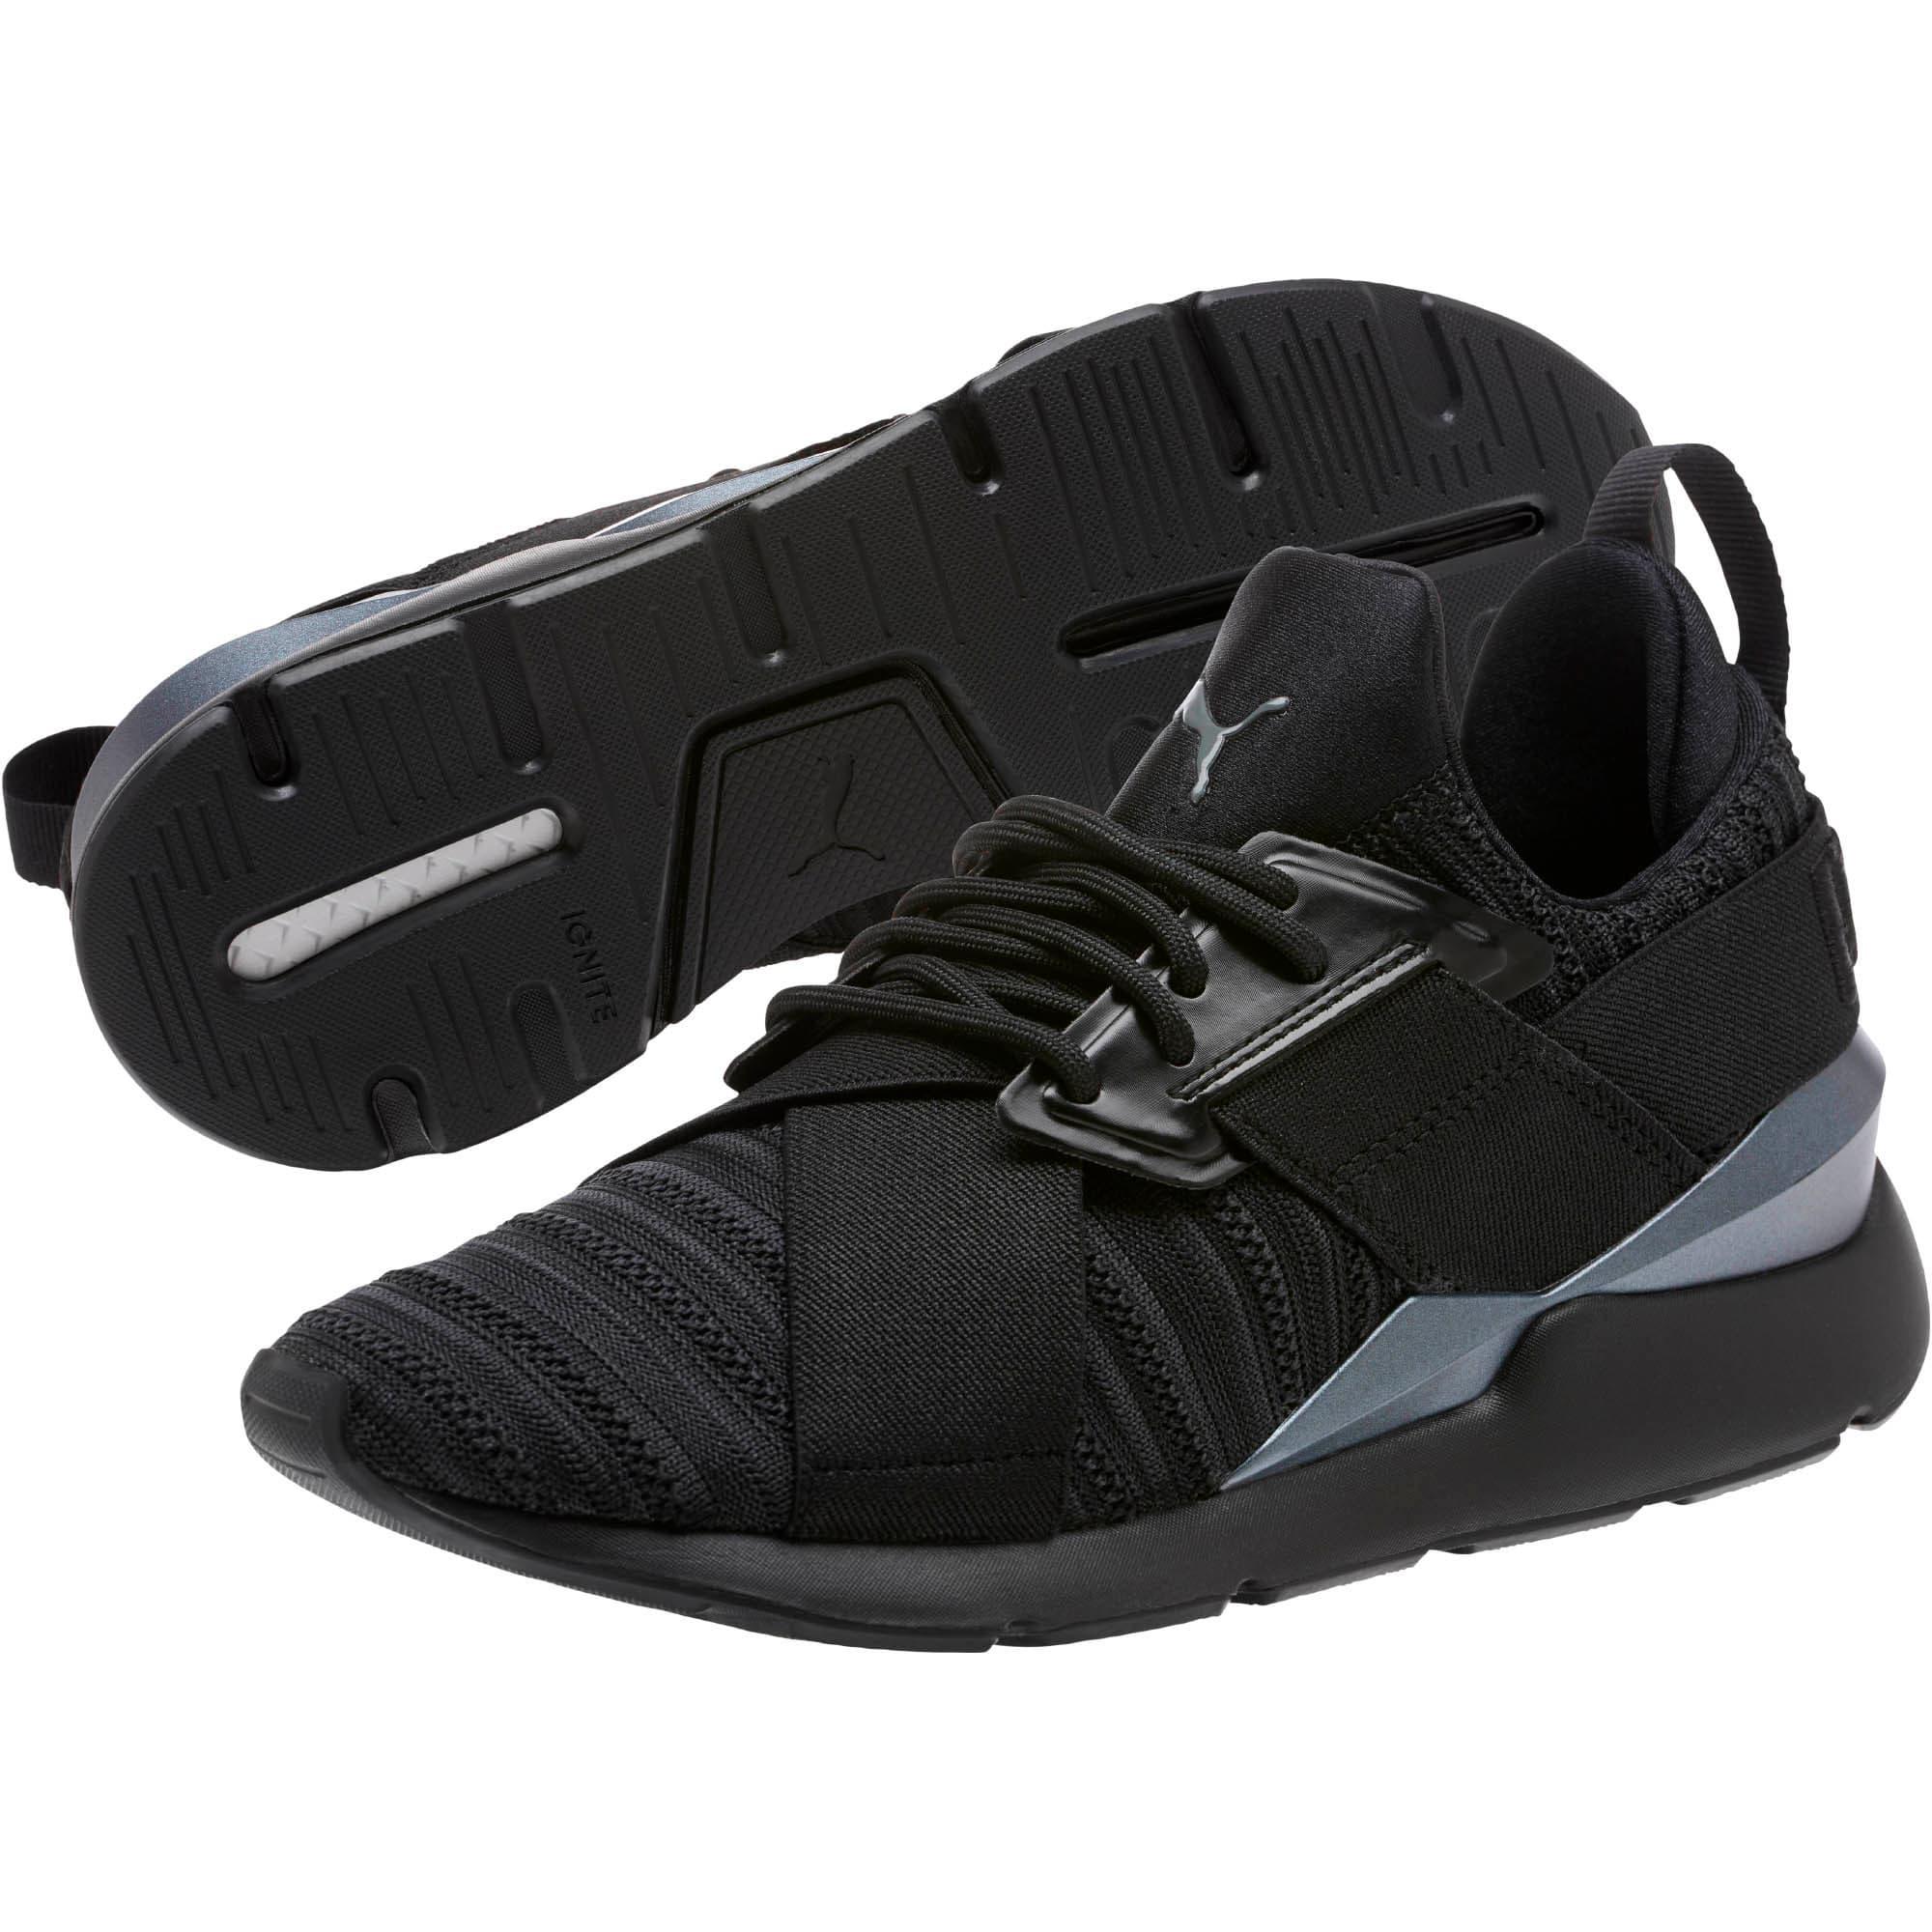 Thumbnail 2 of Muse Knit Women's Sneakers, Iron Gate-Puma Black, medium